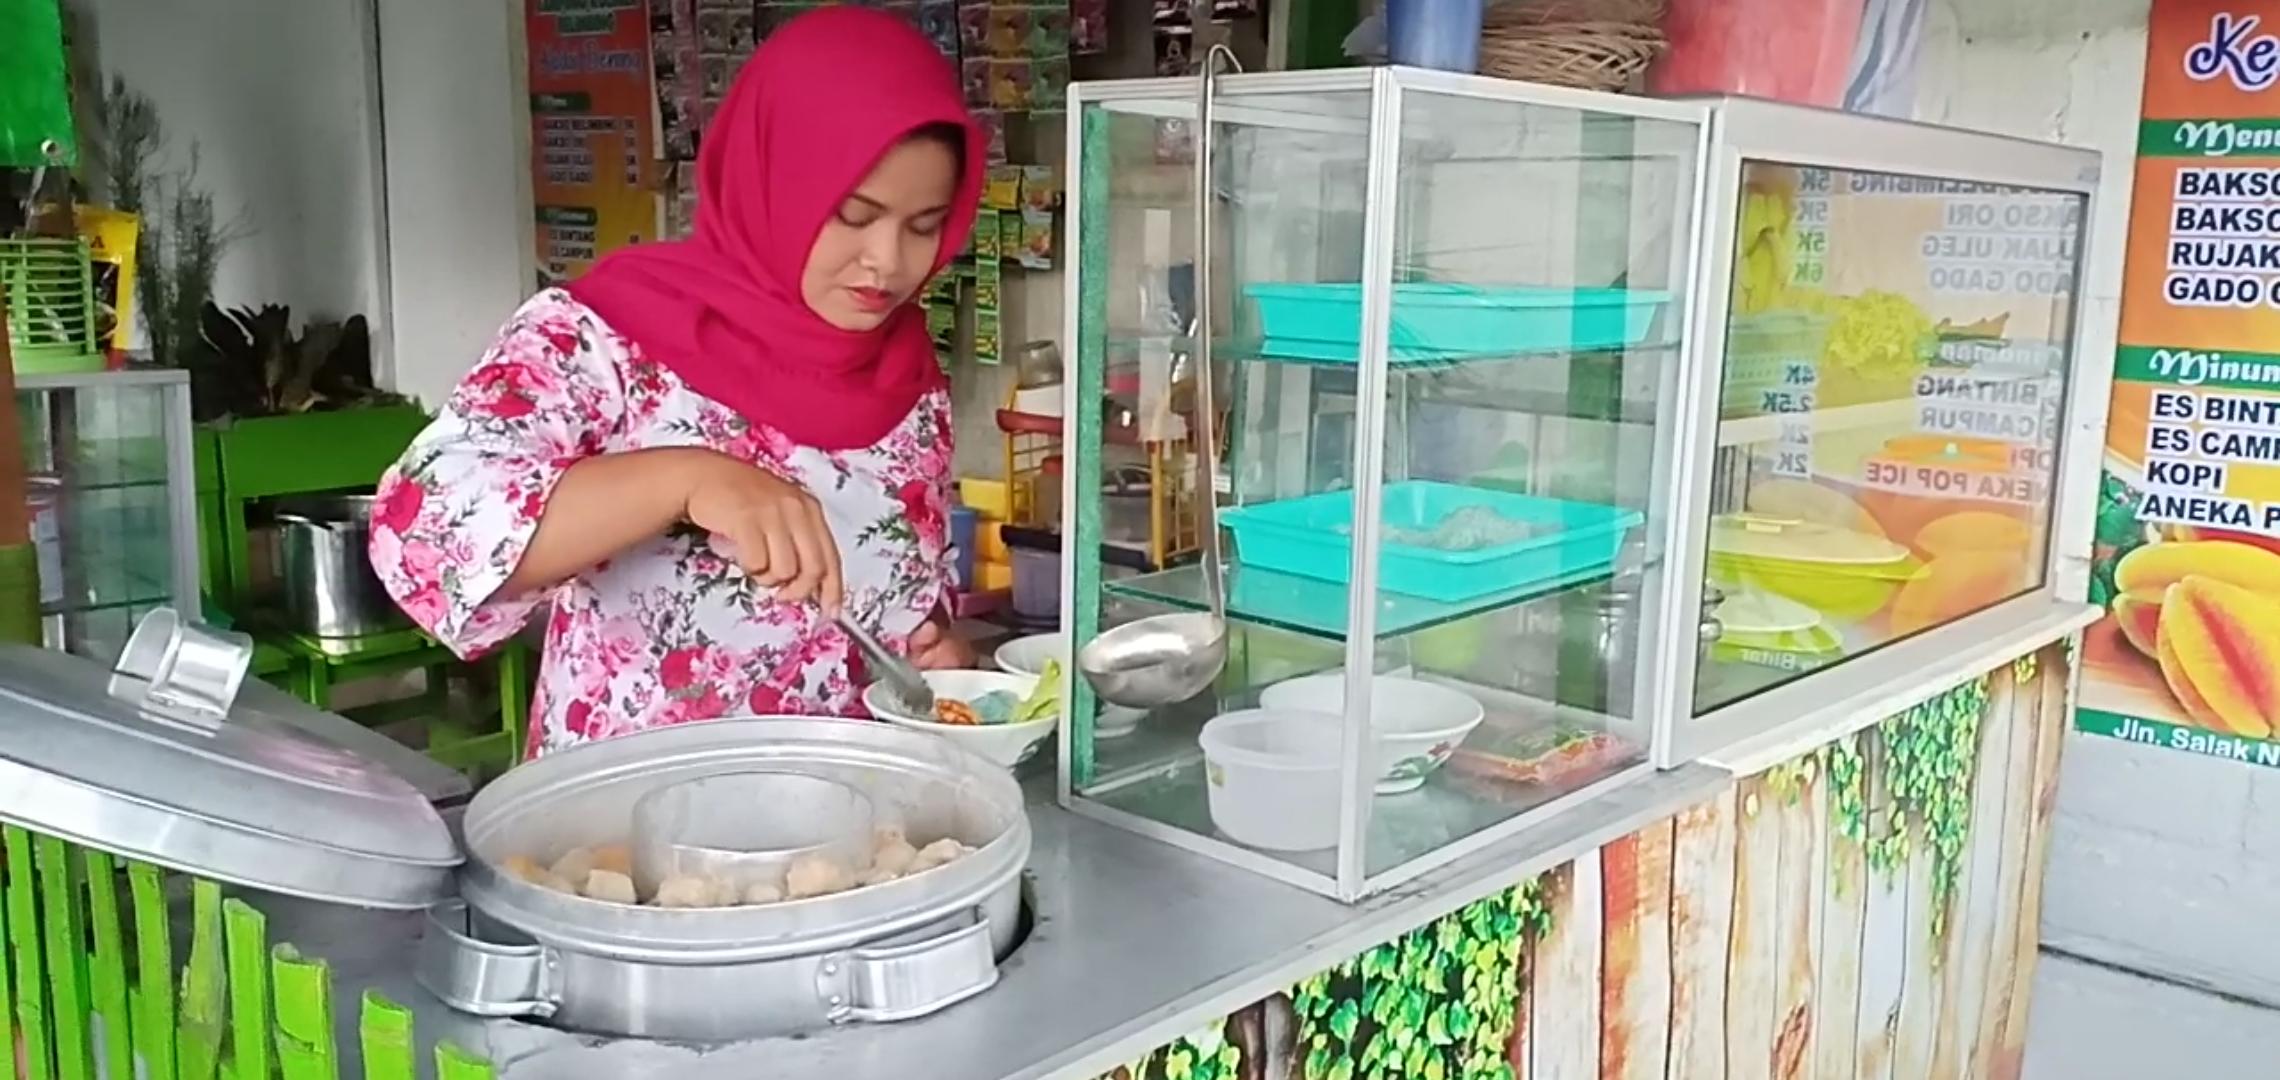 Kedai bakso belimbing di Agro Wisata Belimbing Karangsari.(Ist)